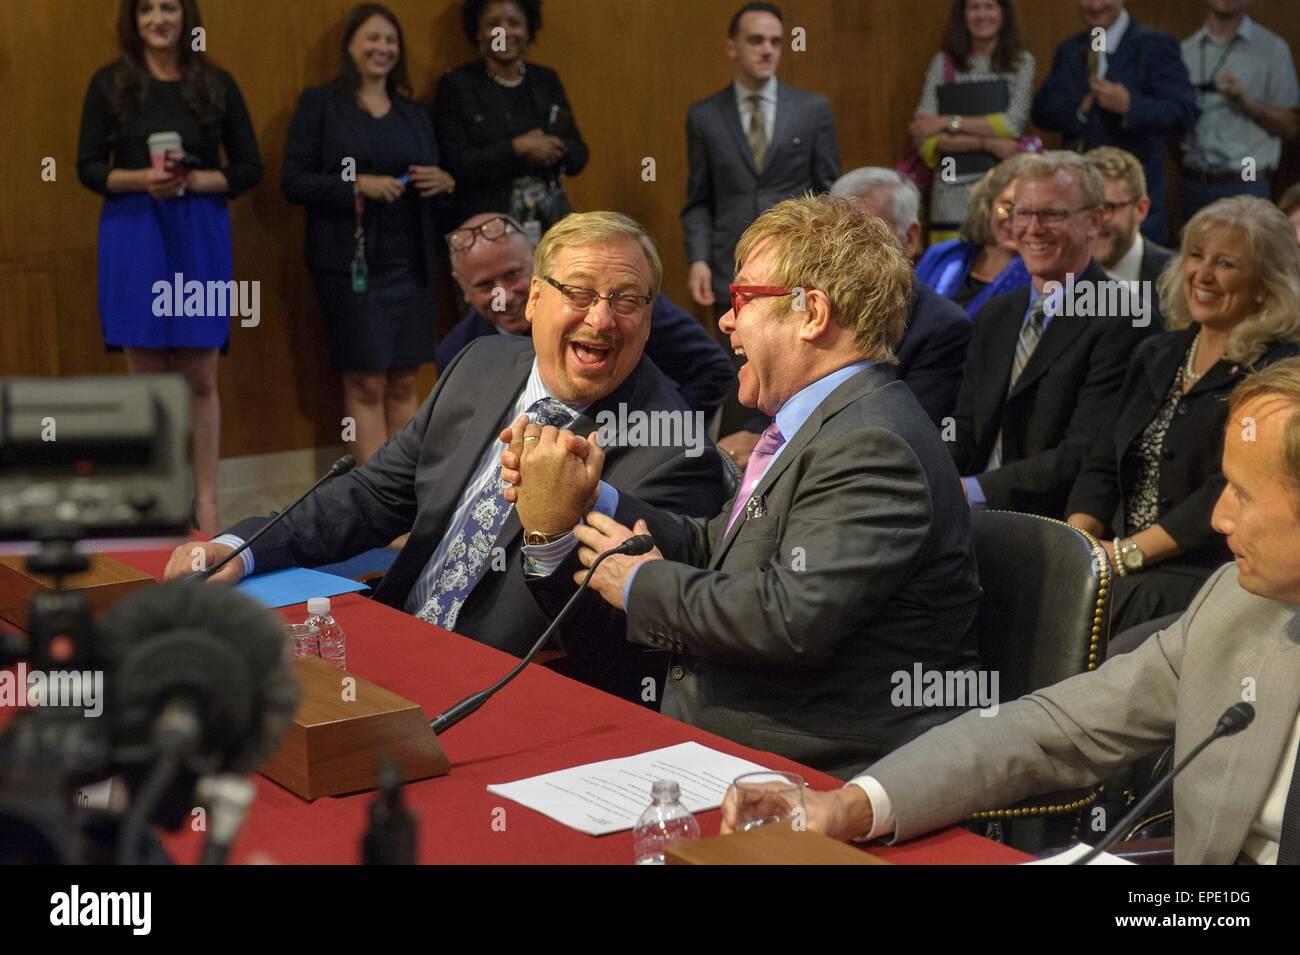 Singer Elton John and pastor of the Saddleback Church Rick Warren shake hands prior to testifying before the Senate - Stock Image